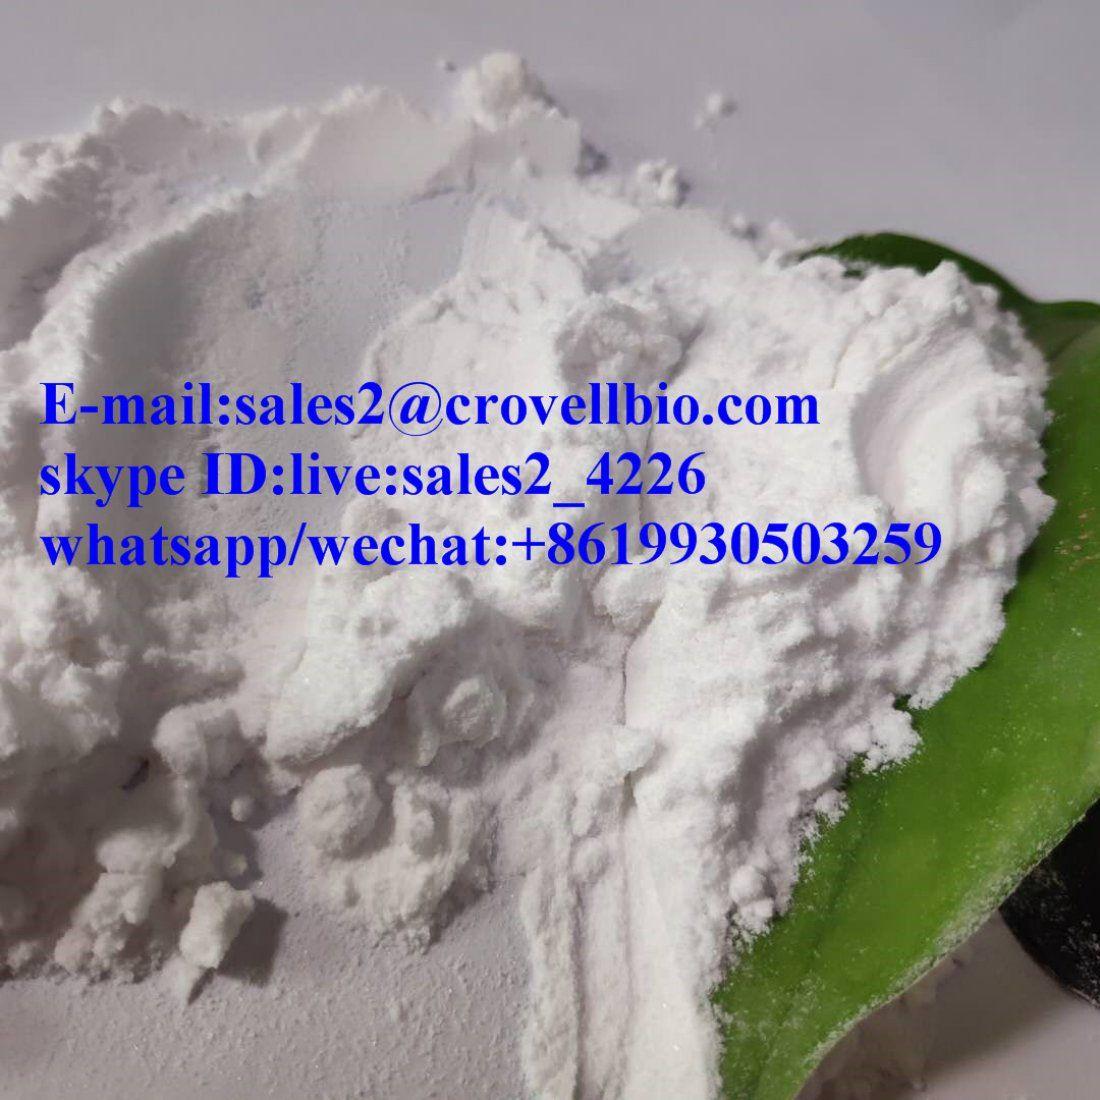 Crovell factory supply unique quality Phenacetin CAS 62-44-2 sales2